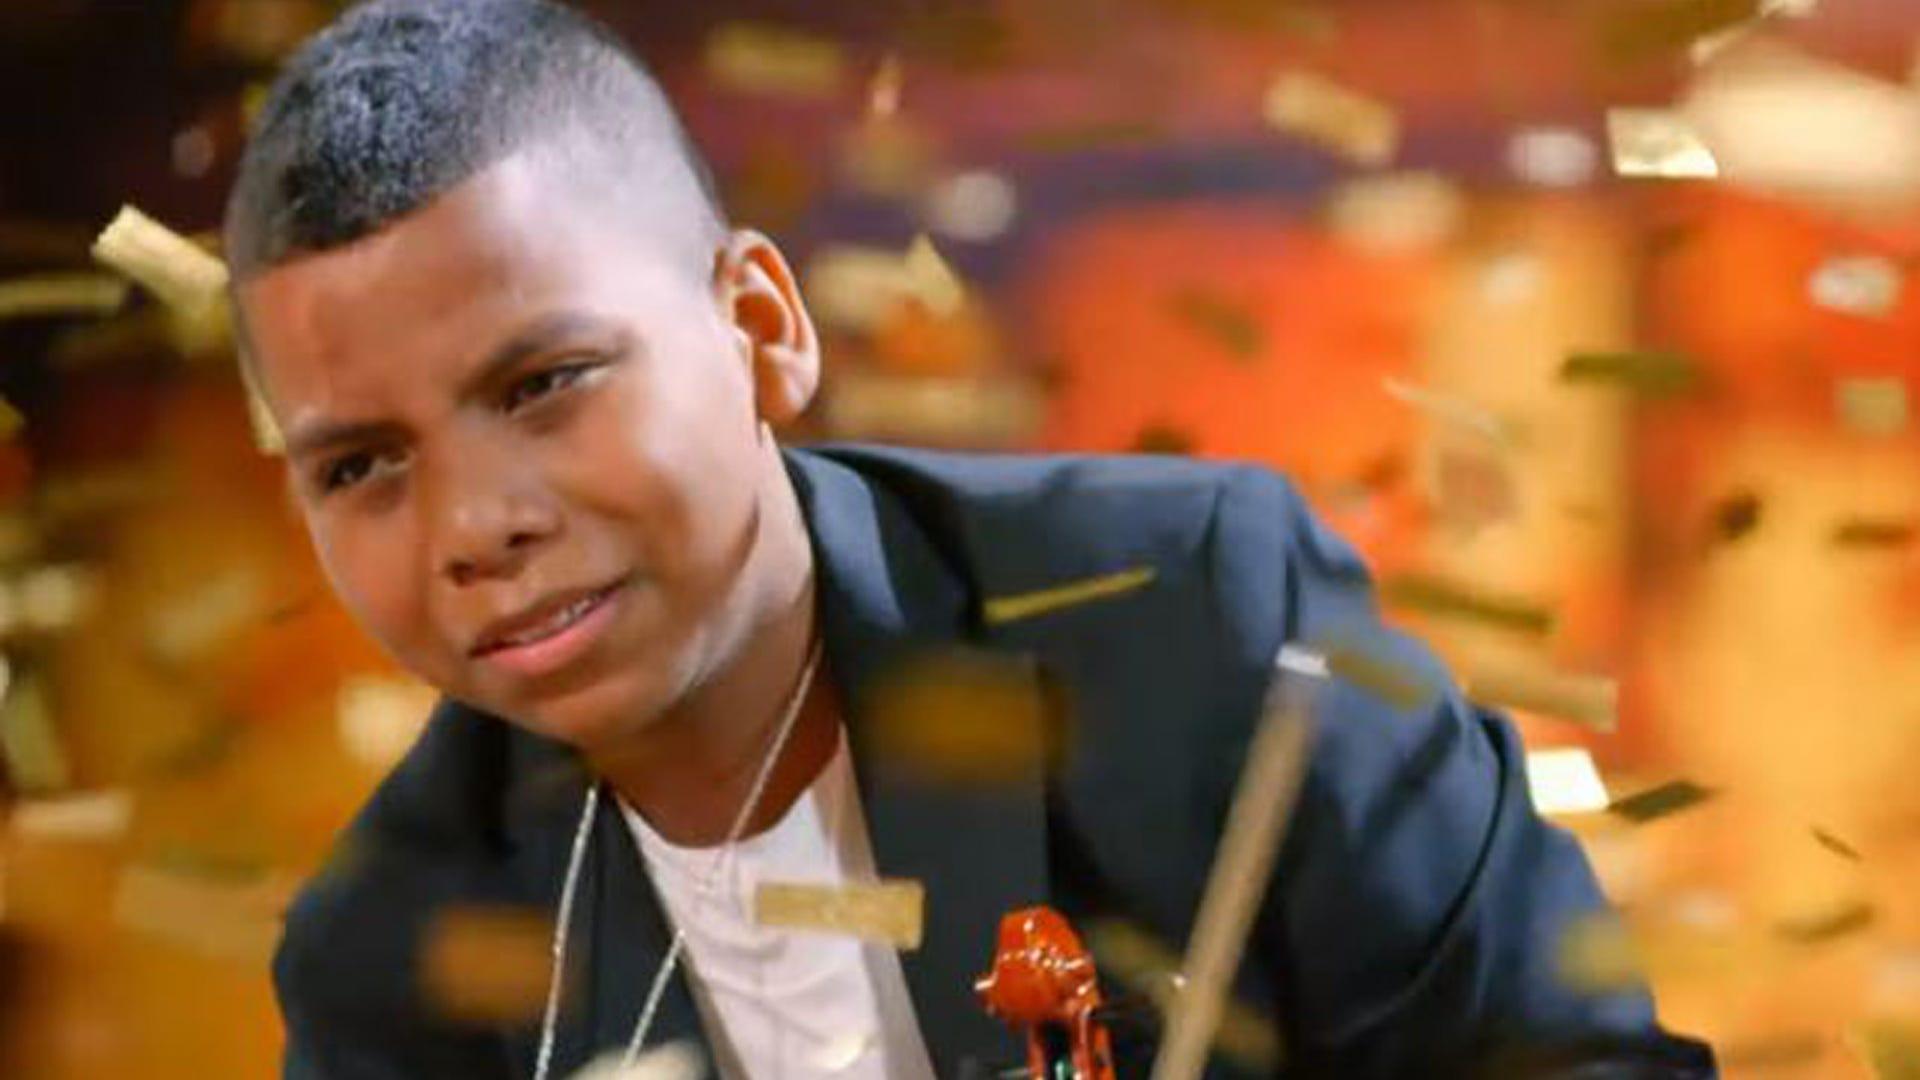 Tyler Butler-Figueroa, America's Got Talent